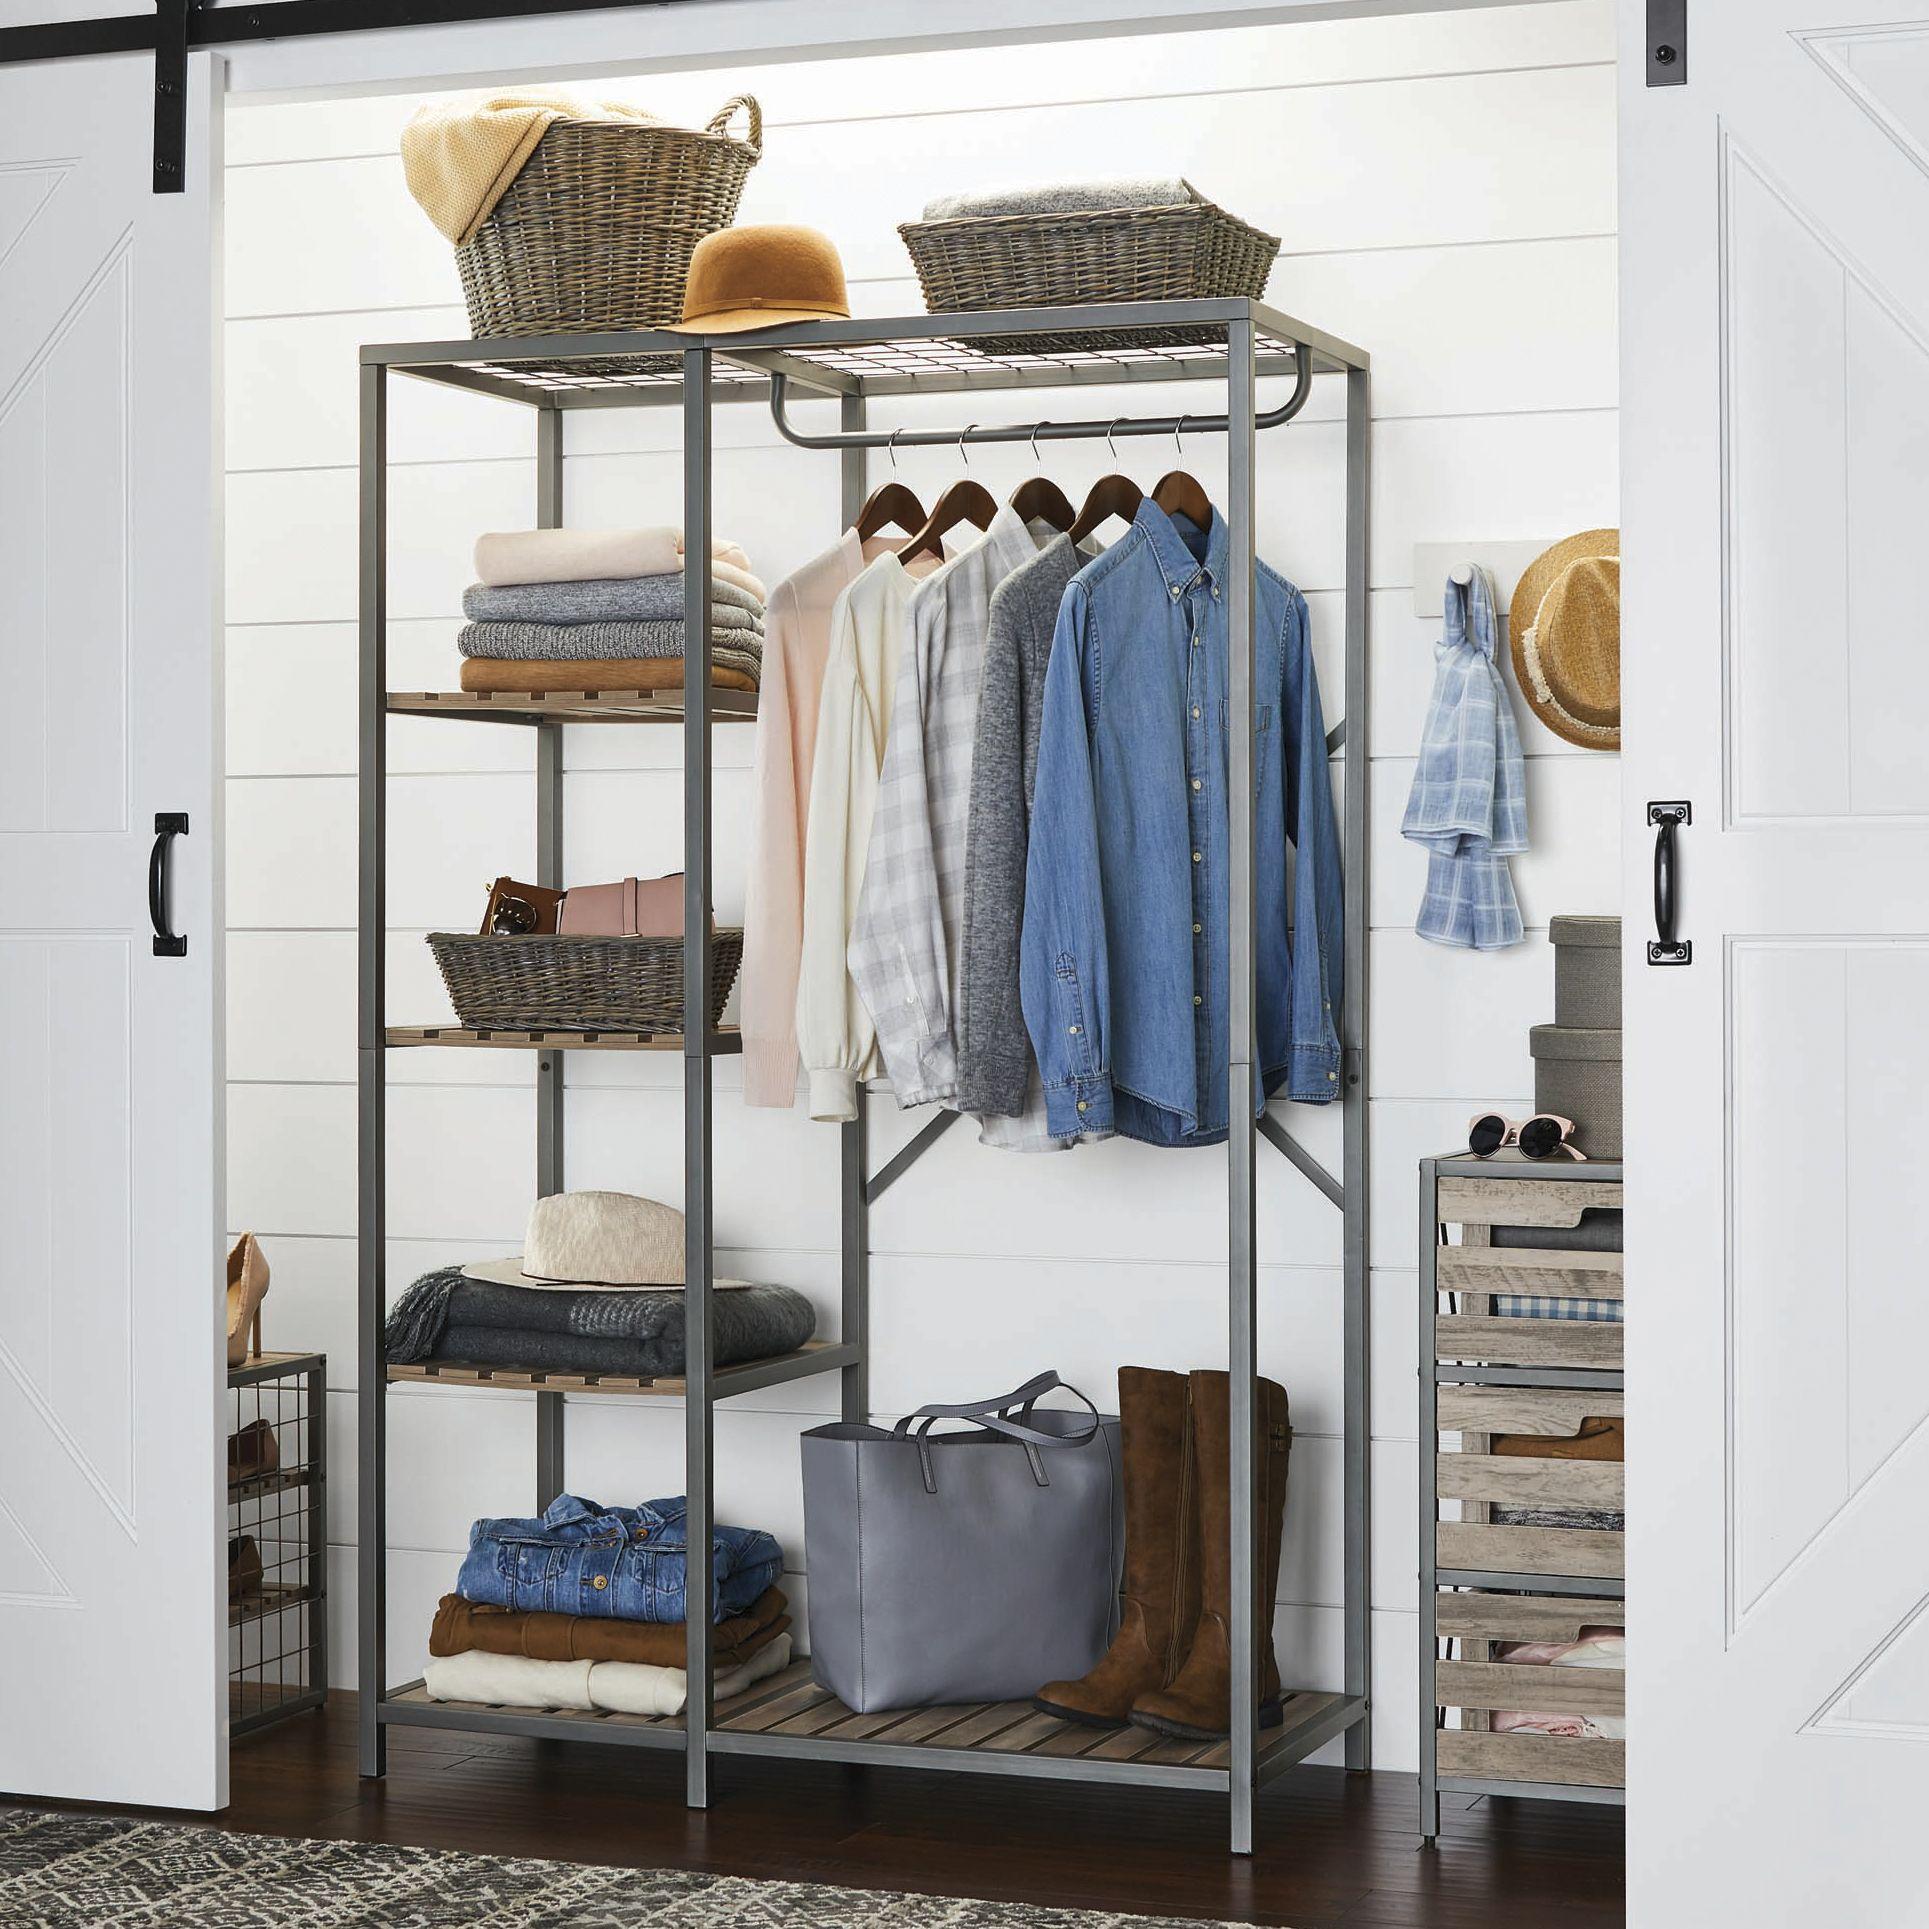 Shop By Brand Garment Racks Wardrobe Design Grey Wood